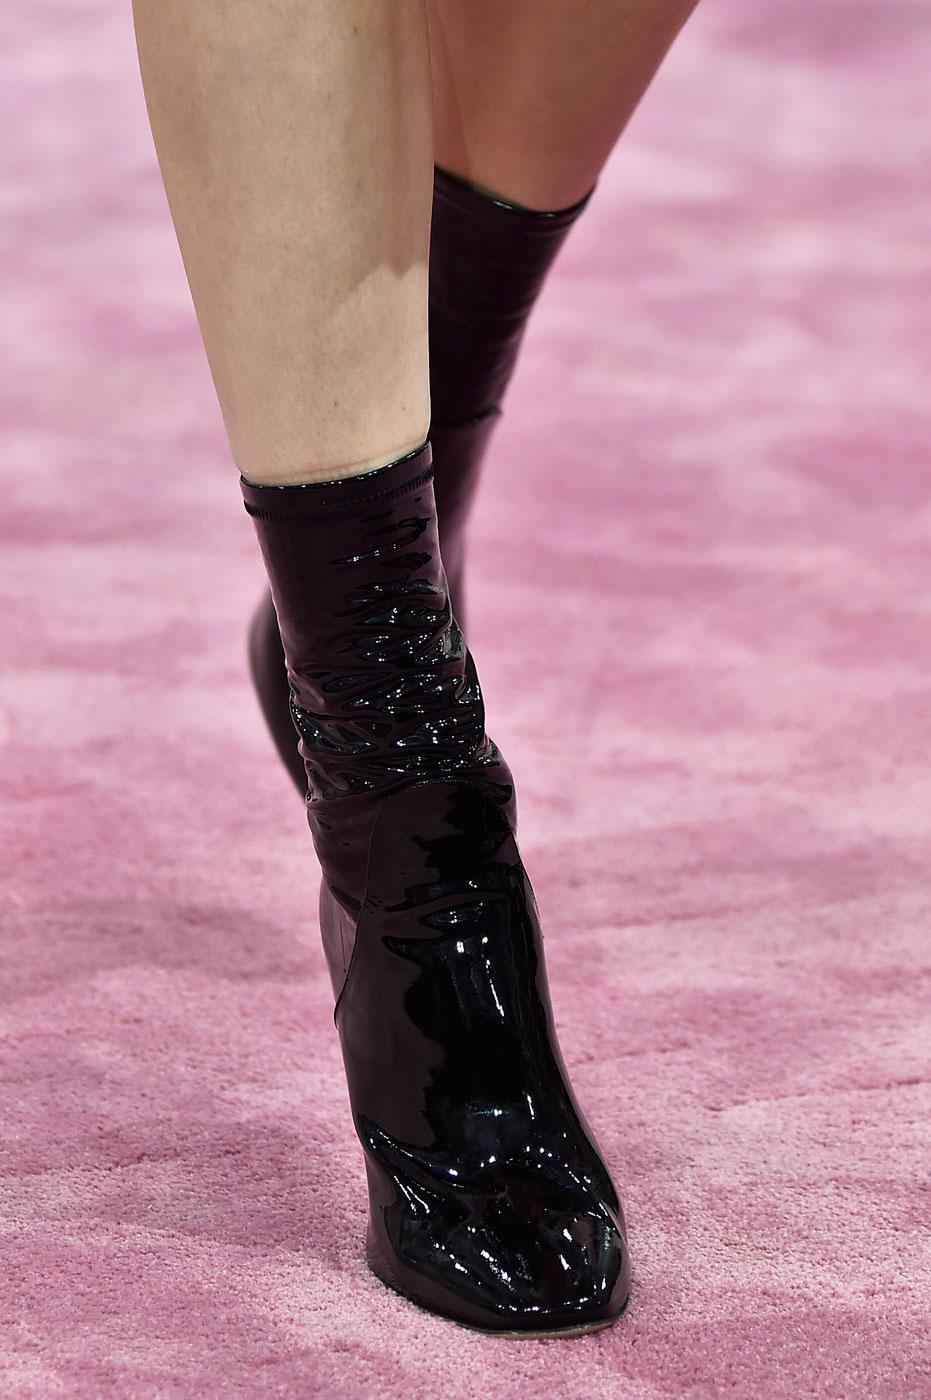 Christian-Dior-fashion-runway-show-close-ups-haute-couture-paris-spring-summer-2015-the-impression-100